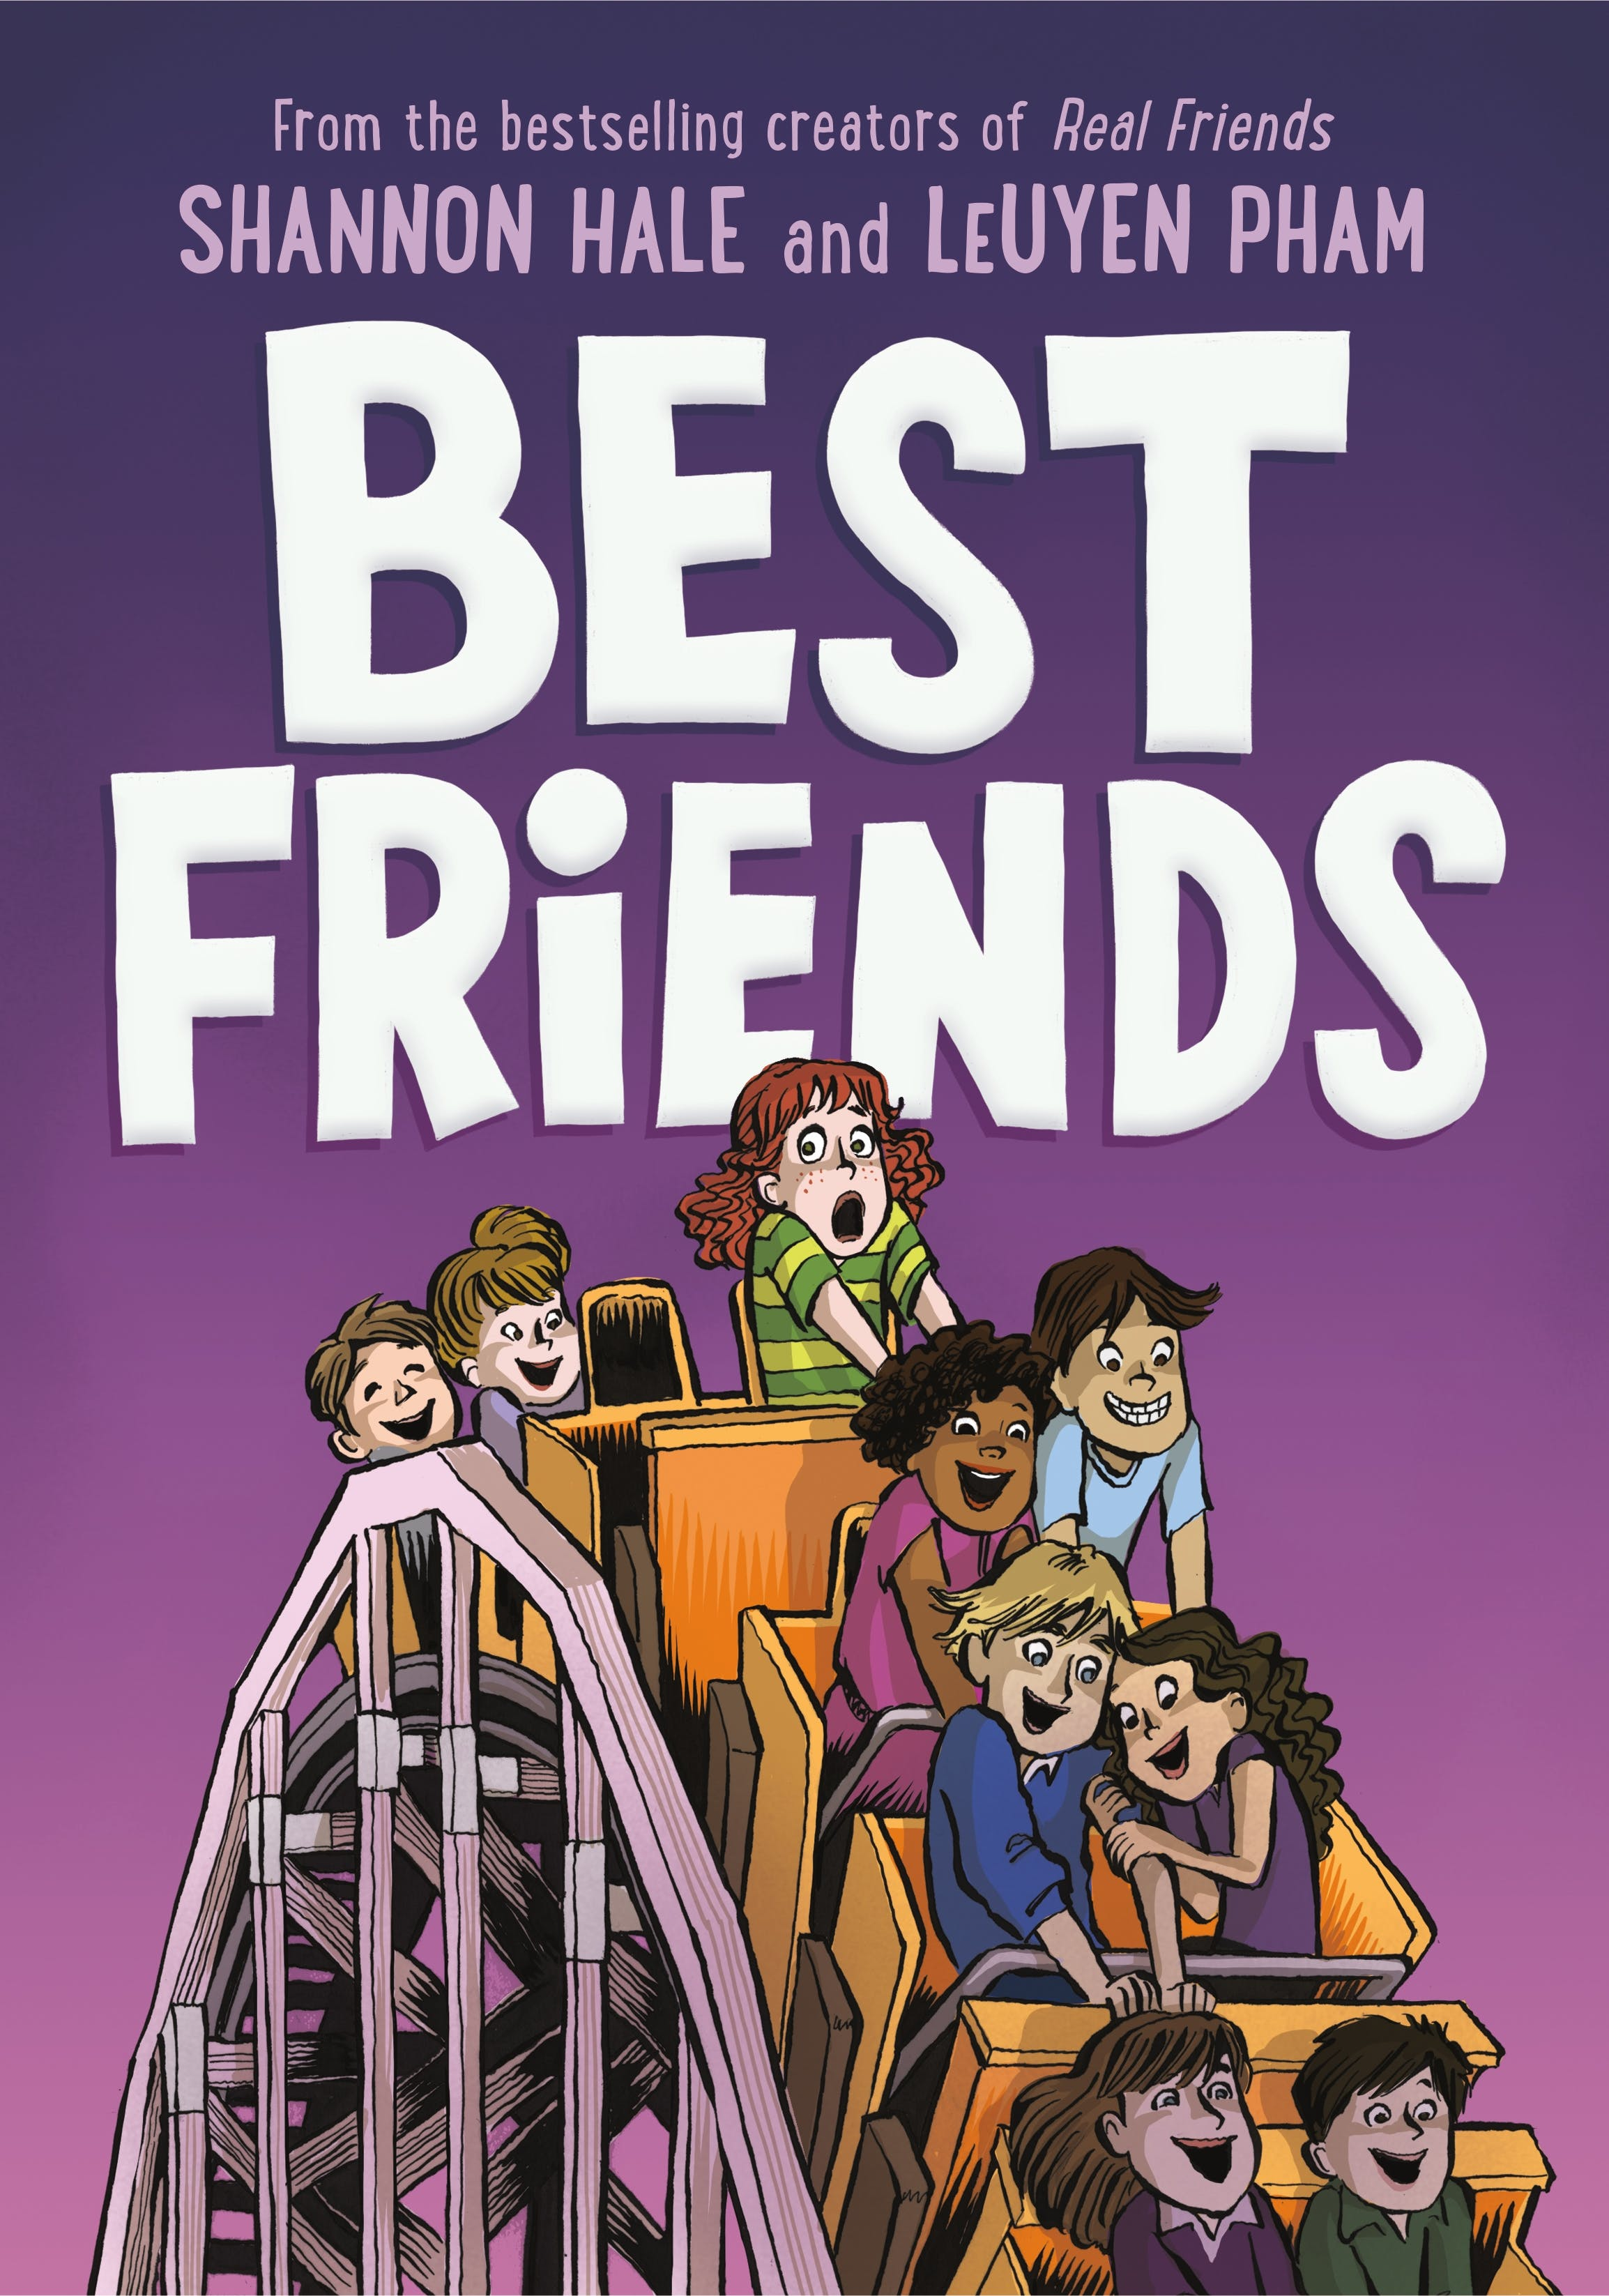 Image of Best Friends